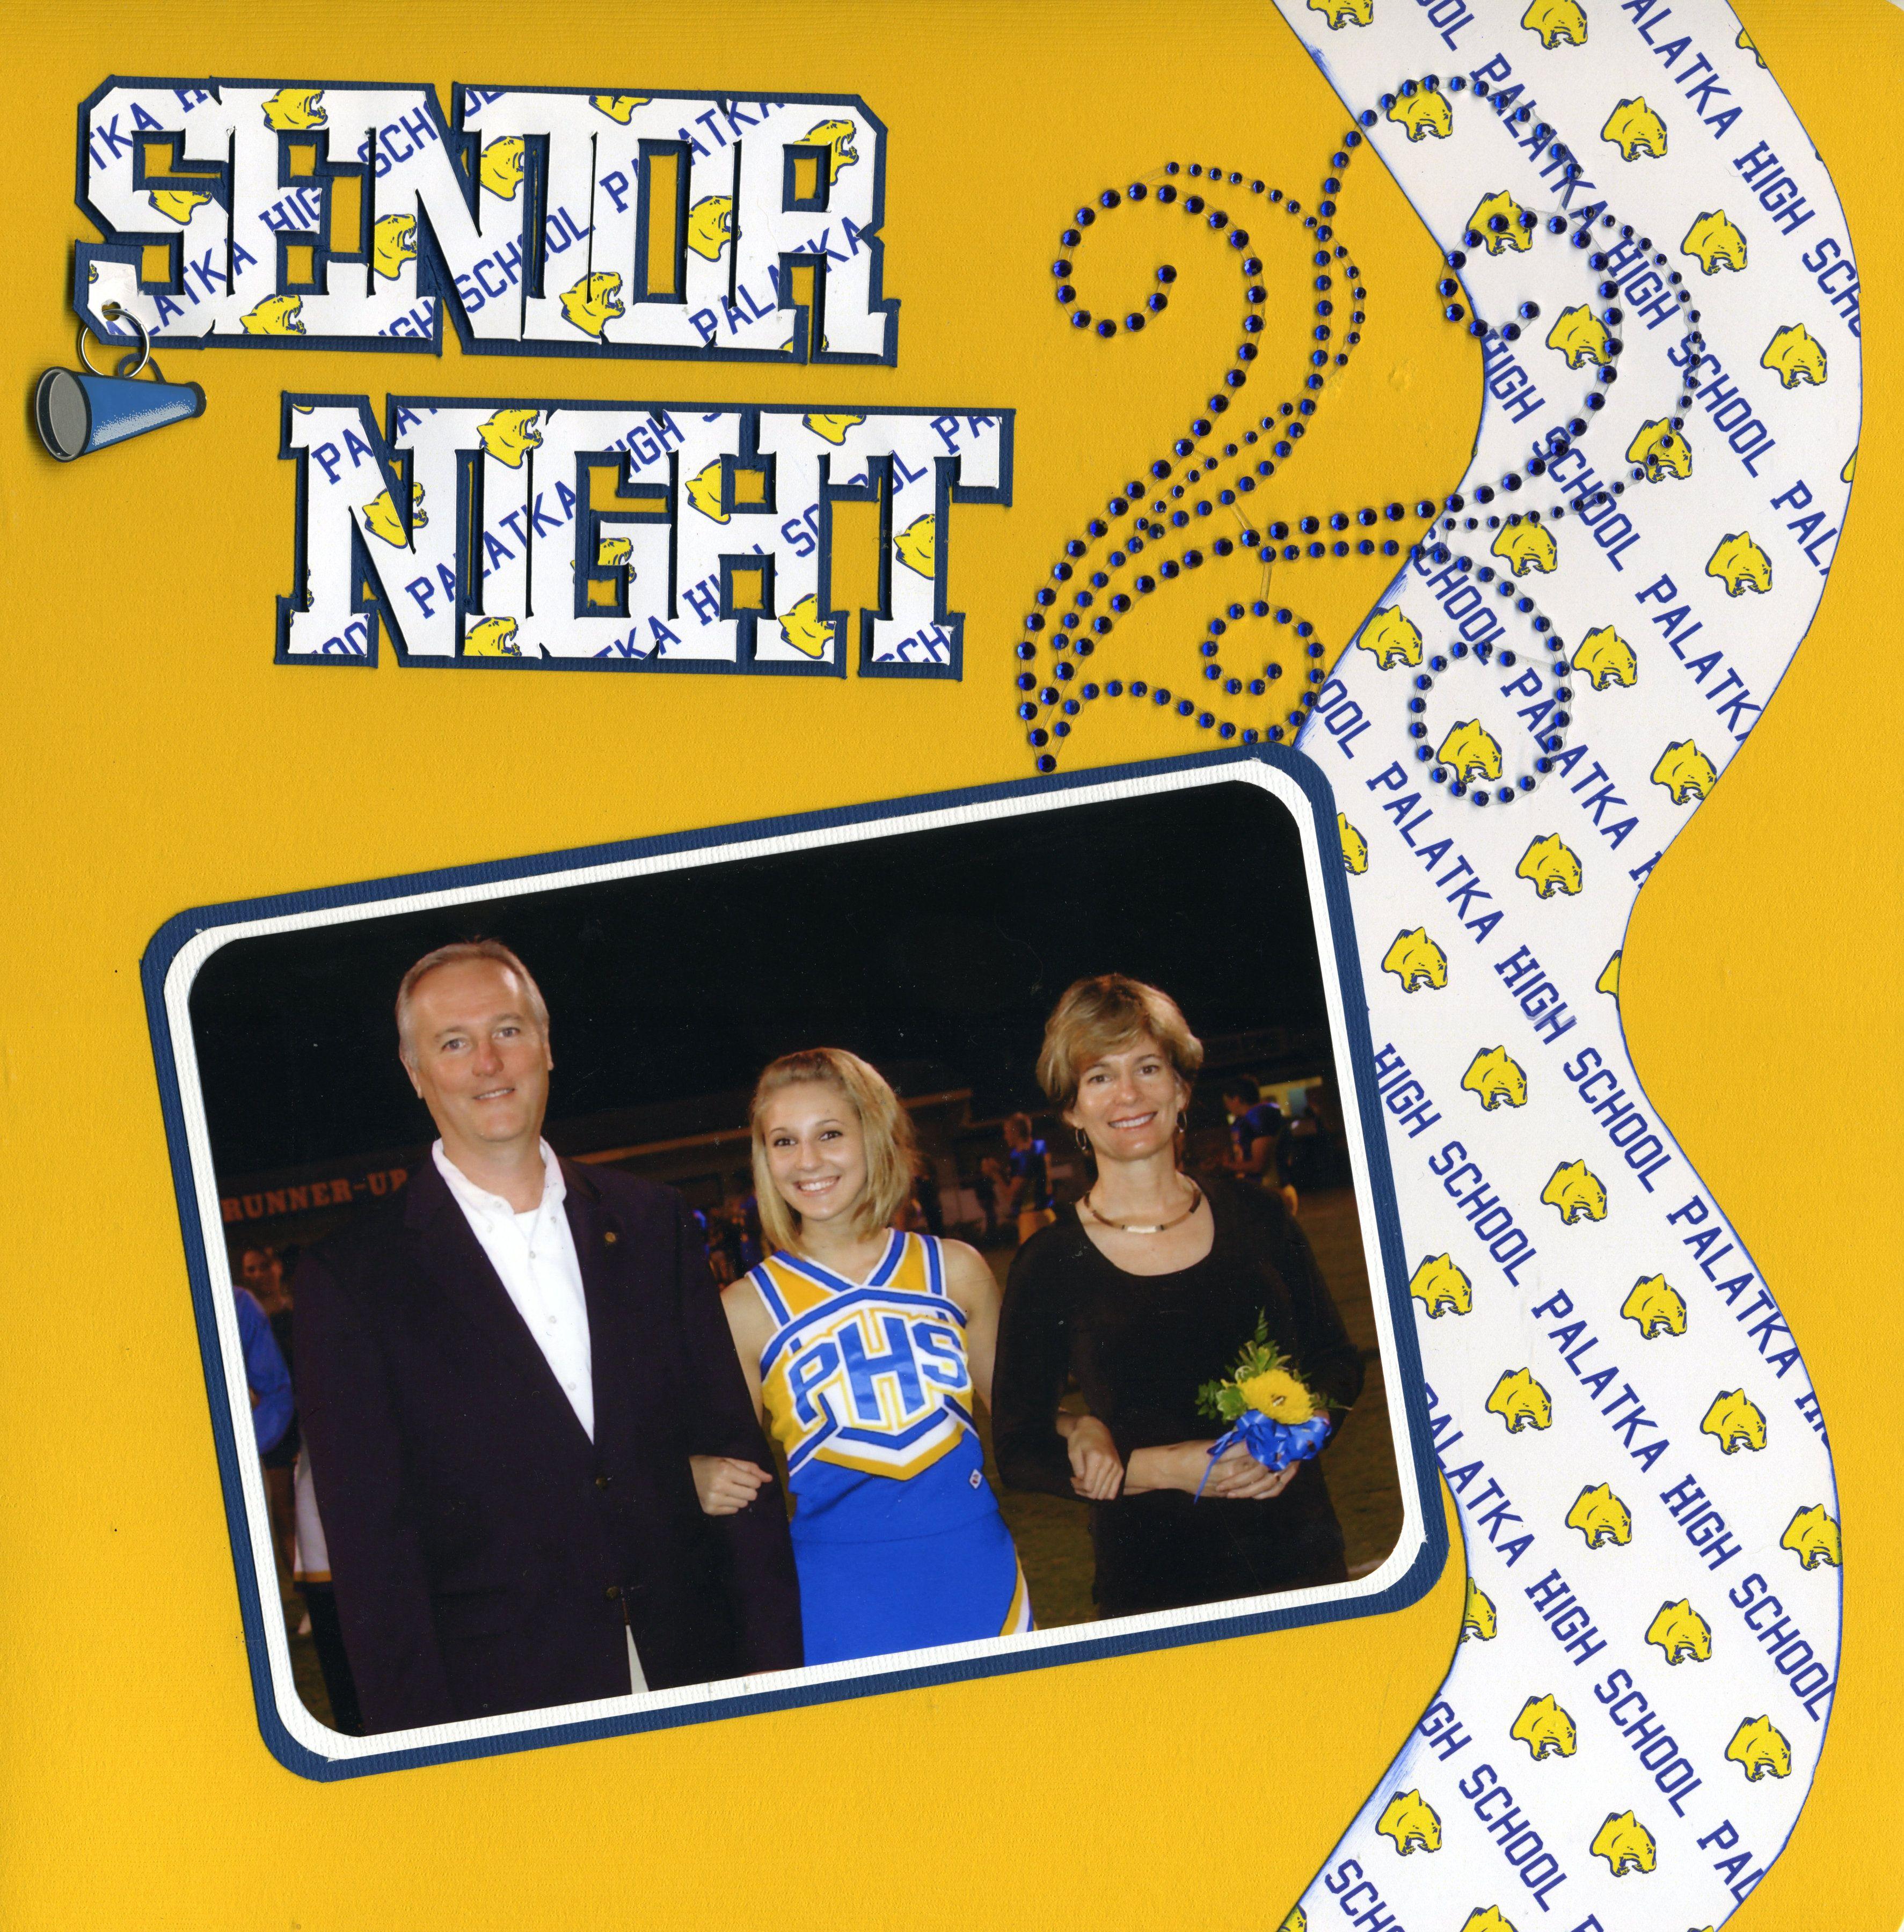 Graduation scrapbook ideas pinterest - Senior Night Scrapbook Com